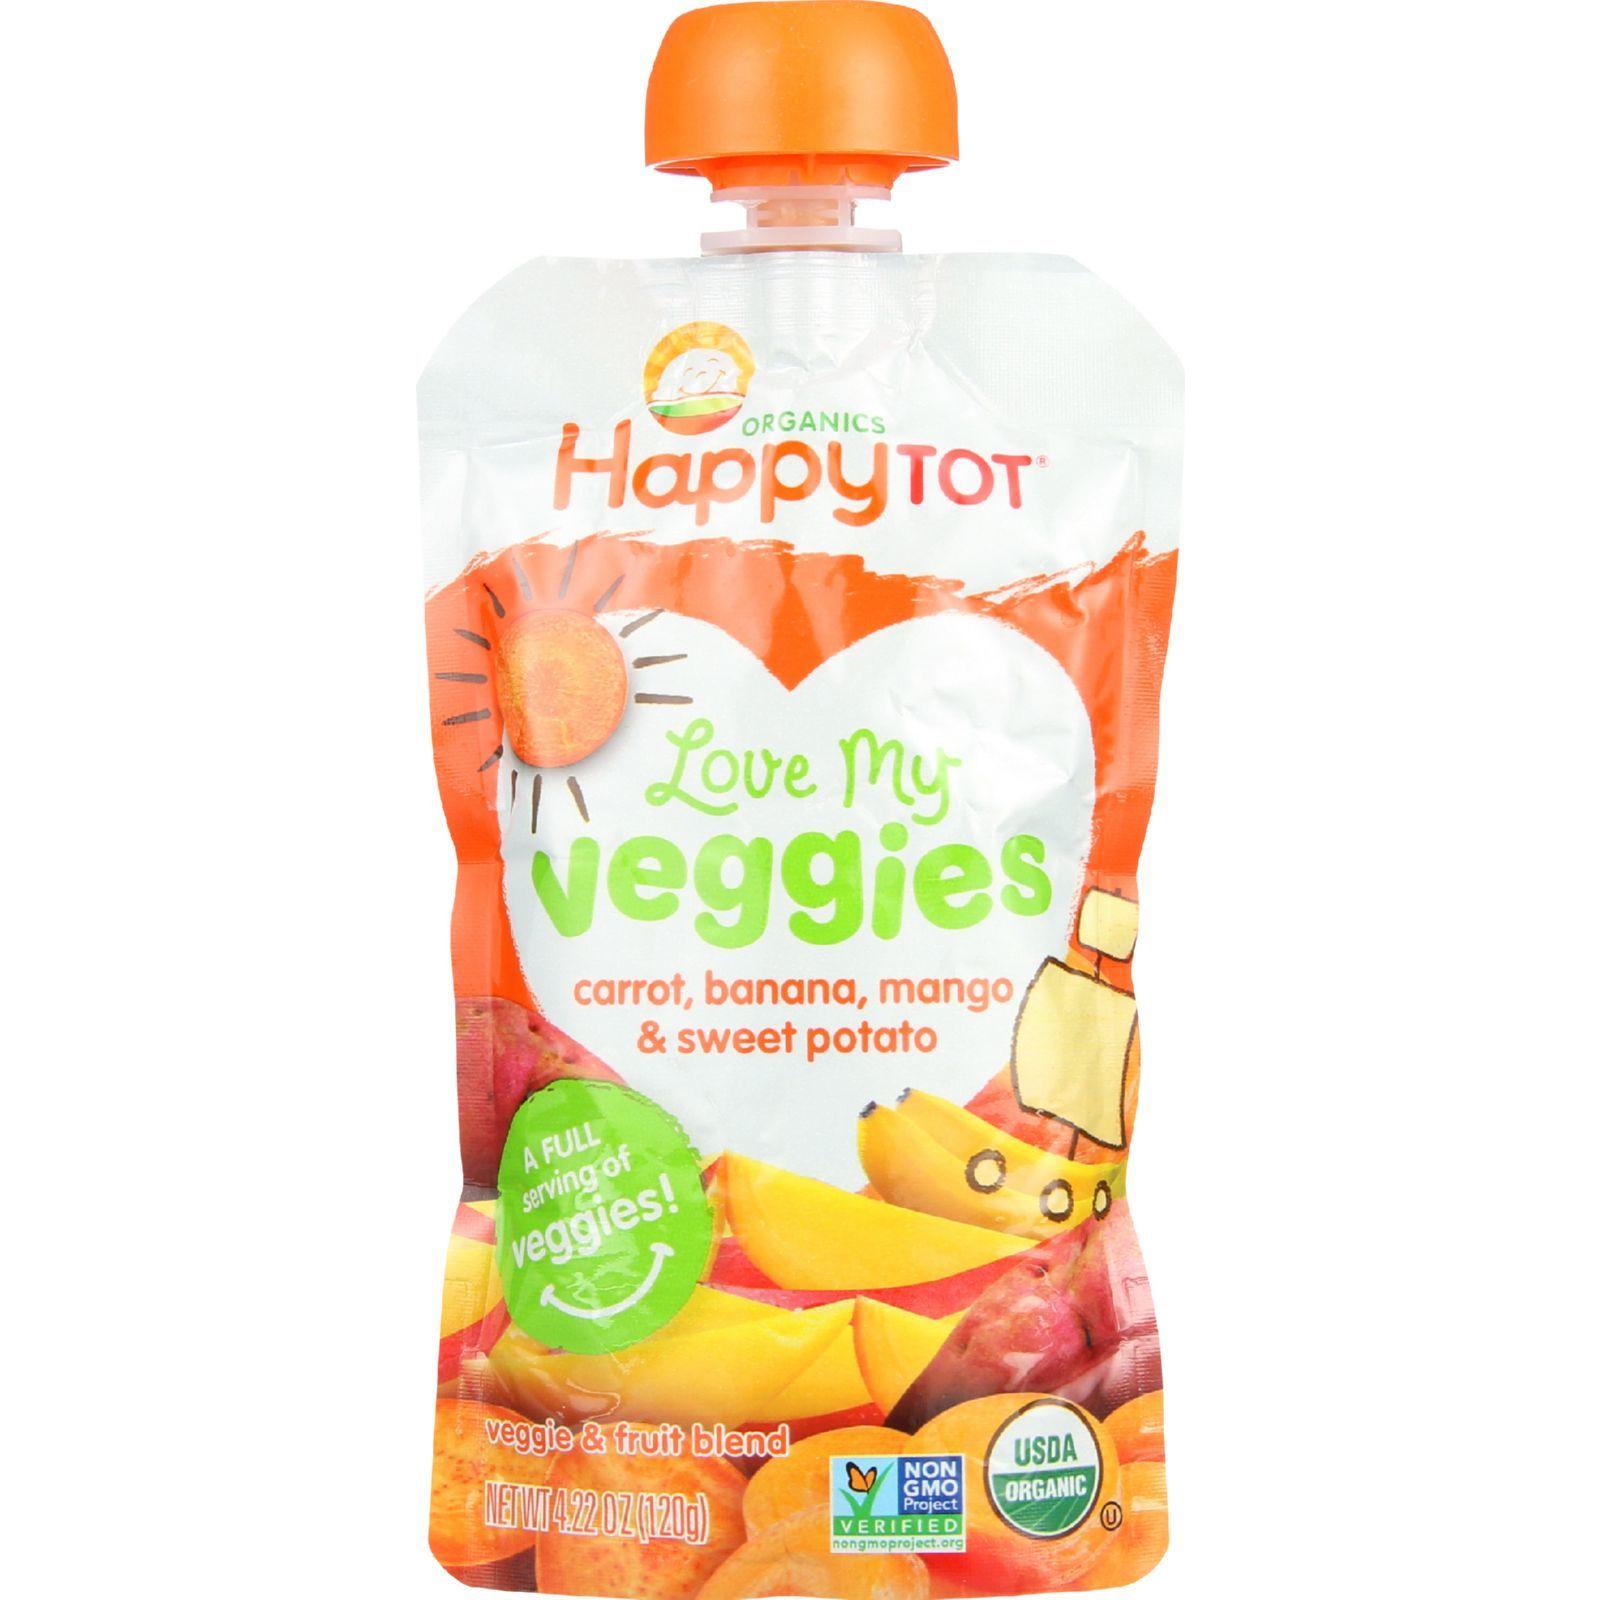 Happy Tot Toodler Food - Organic - Love My Veggies - Carrot Banana Mango and Sweet Potato - 4.22 oz - case of 16